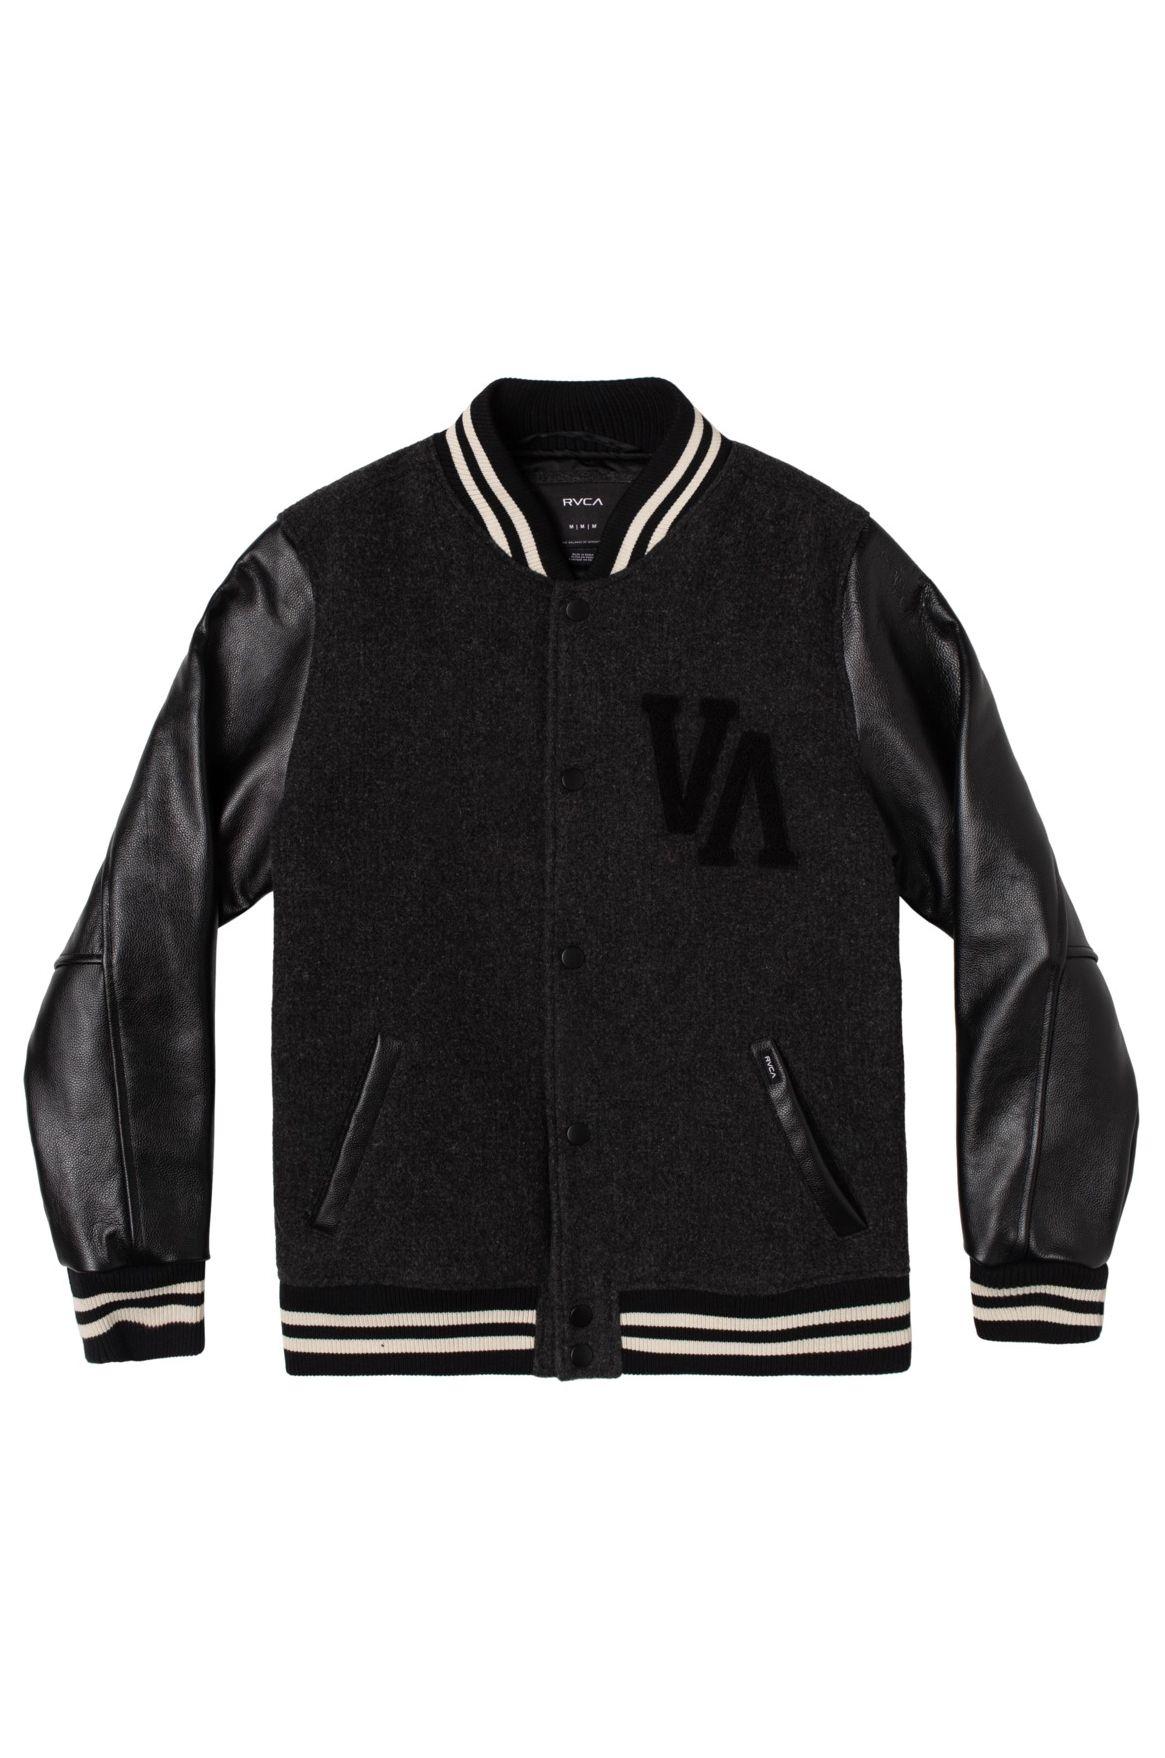 RVCA Jacket JUNIOR VARSITY LETTE Rvca Black